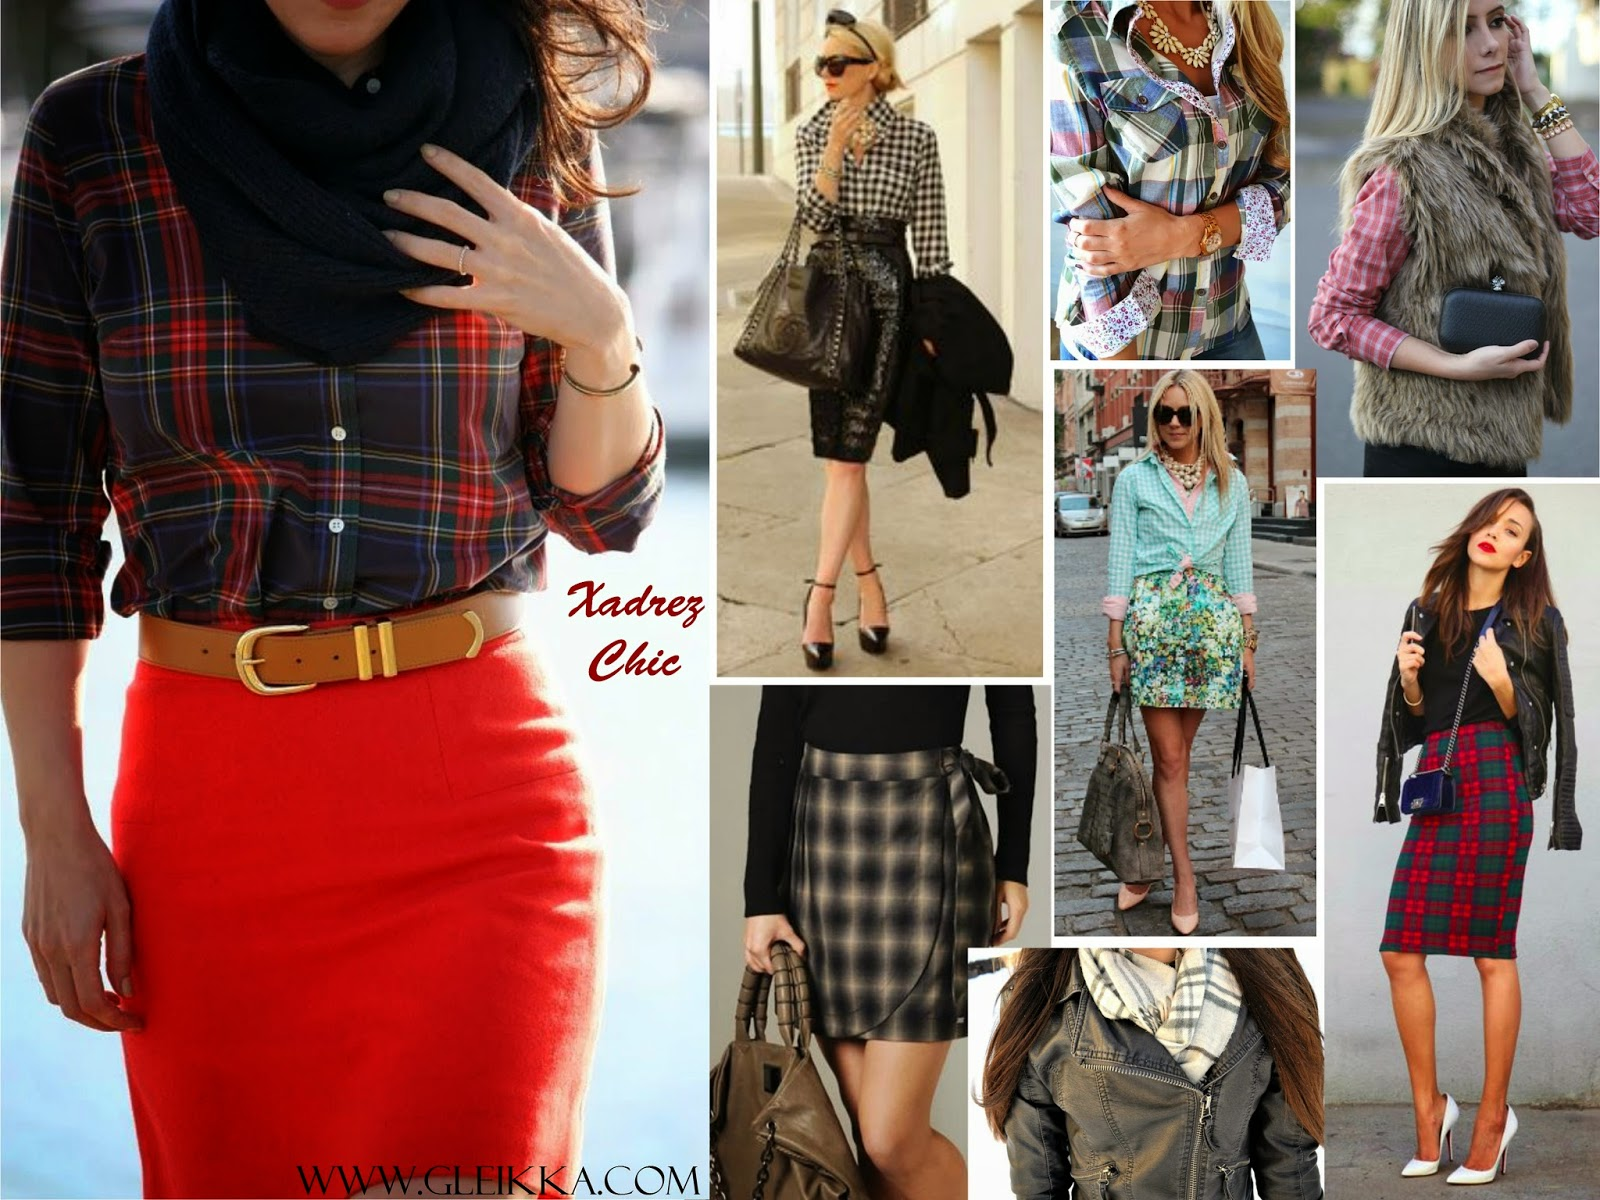 Blog Gleikka, Tendência 2014, Xadrez, Inspiração, Xadrez elegante, Saias xadrez, xadrez chic, look, look feminino, Outono inverno